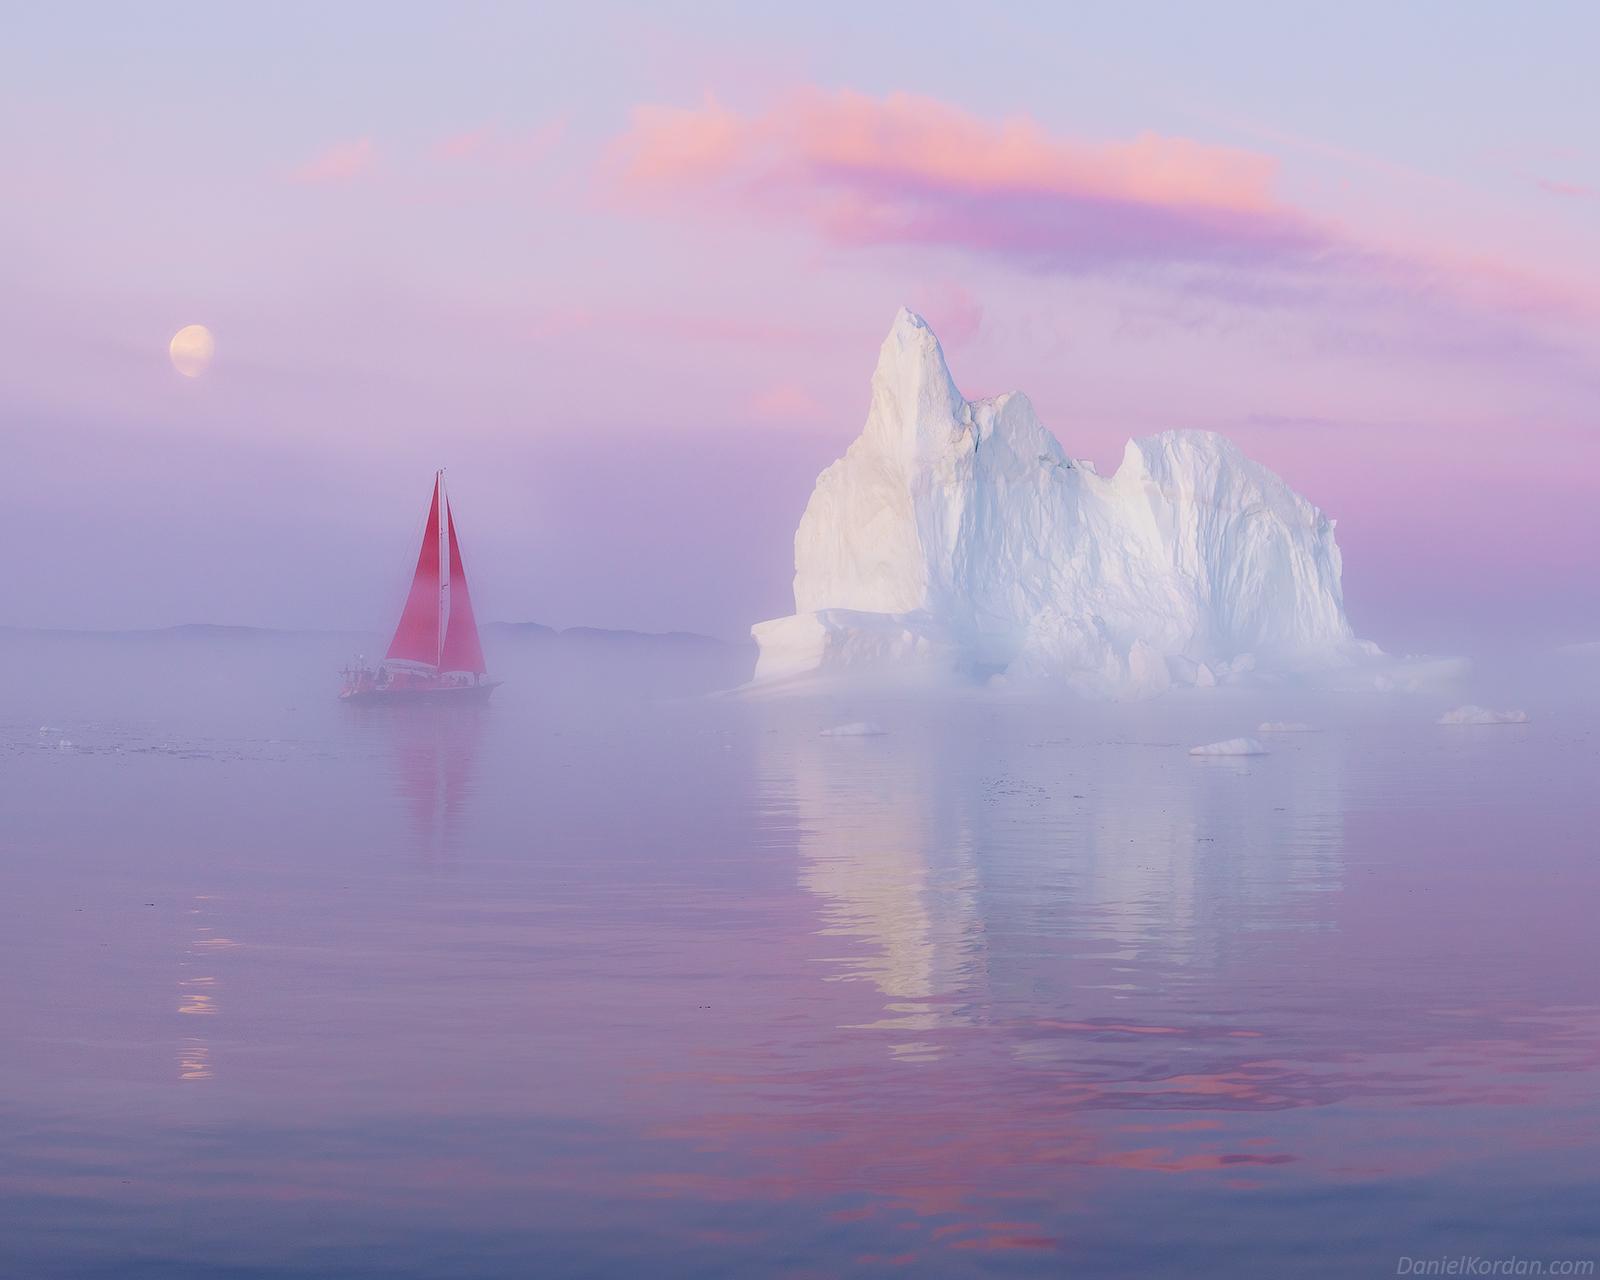 Red Sails in Greenland | Summer Photo Workshop - day 2